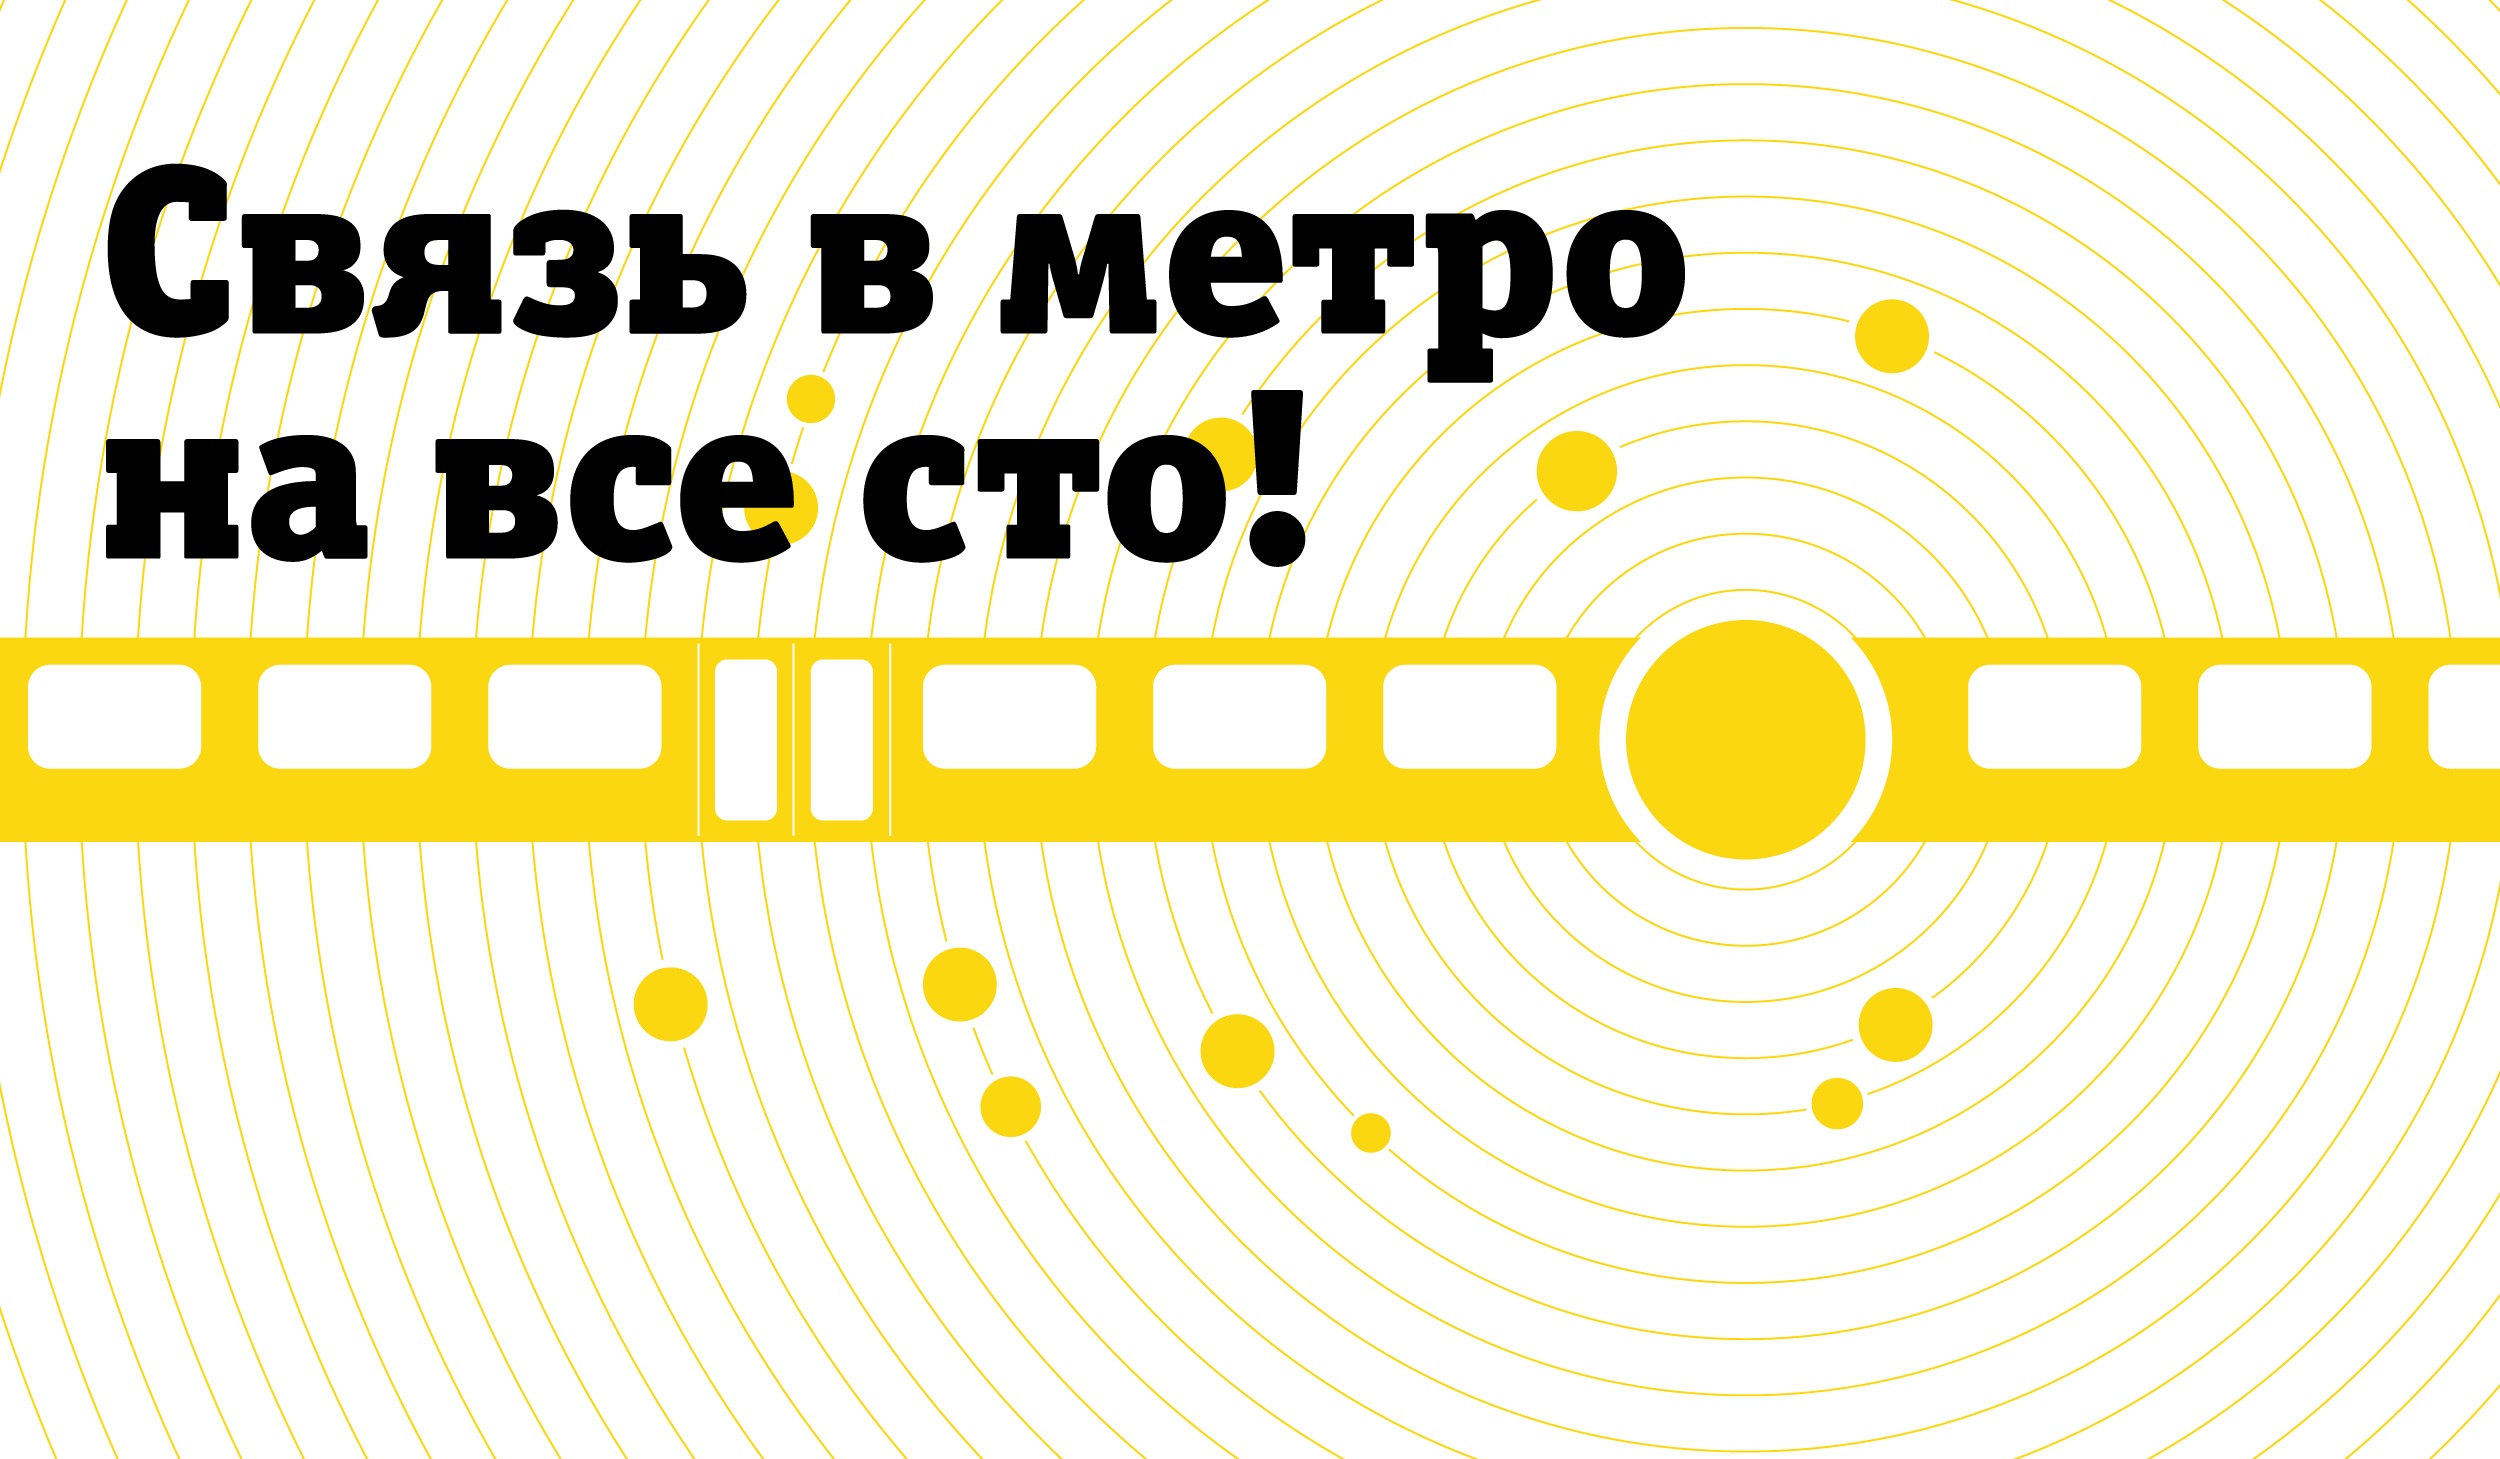 Билайн обеспечил 100% покрытие 4G на всех станциях Московского метрополитена 1